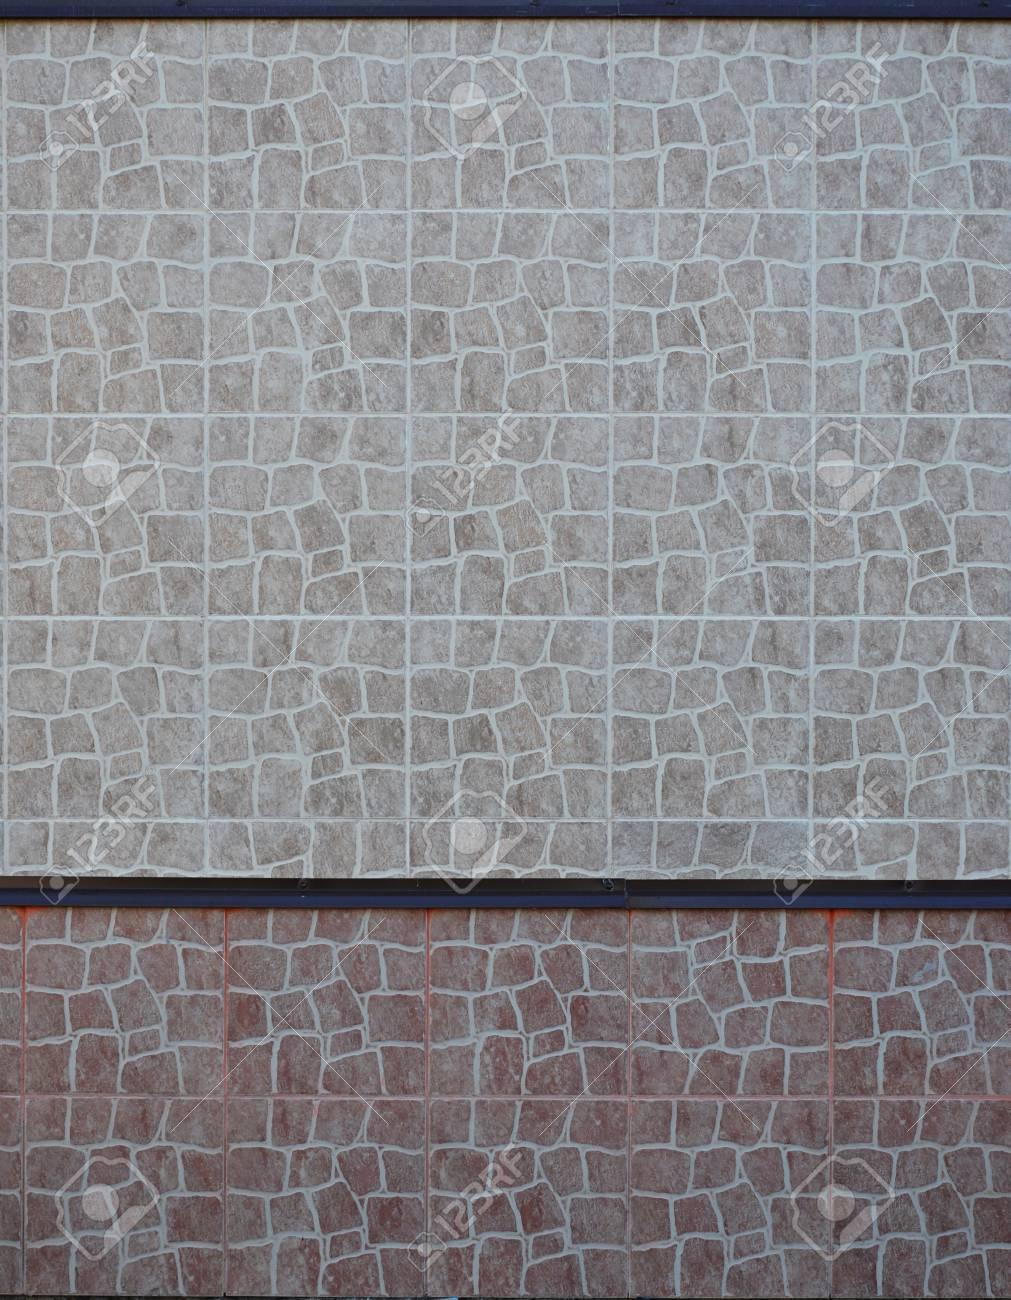 Exterior ceramic wall tile